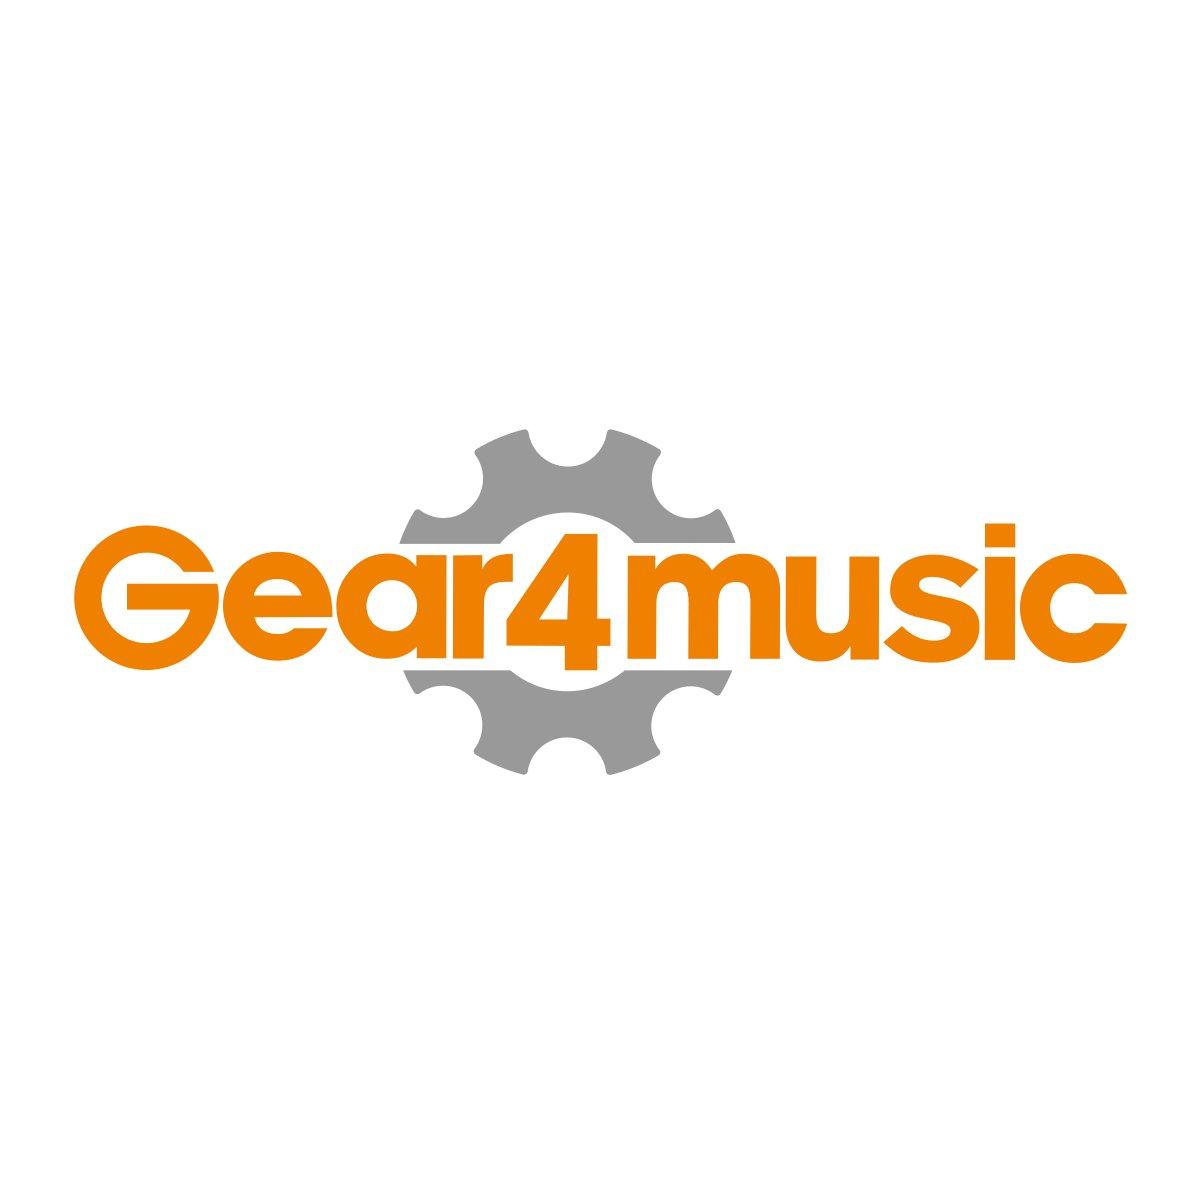 guitare basse electro acoustique par gear4music. Black Bedroom Furniture Sets. Home Design Ideas